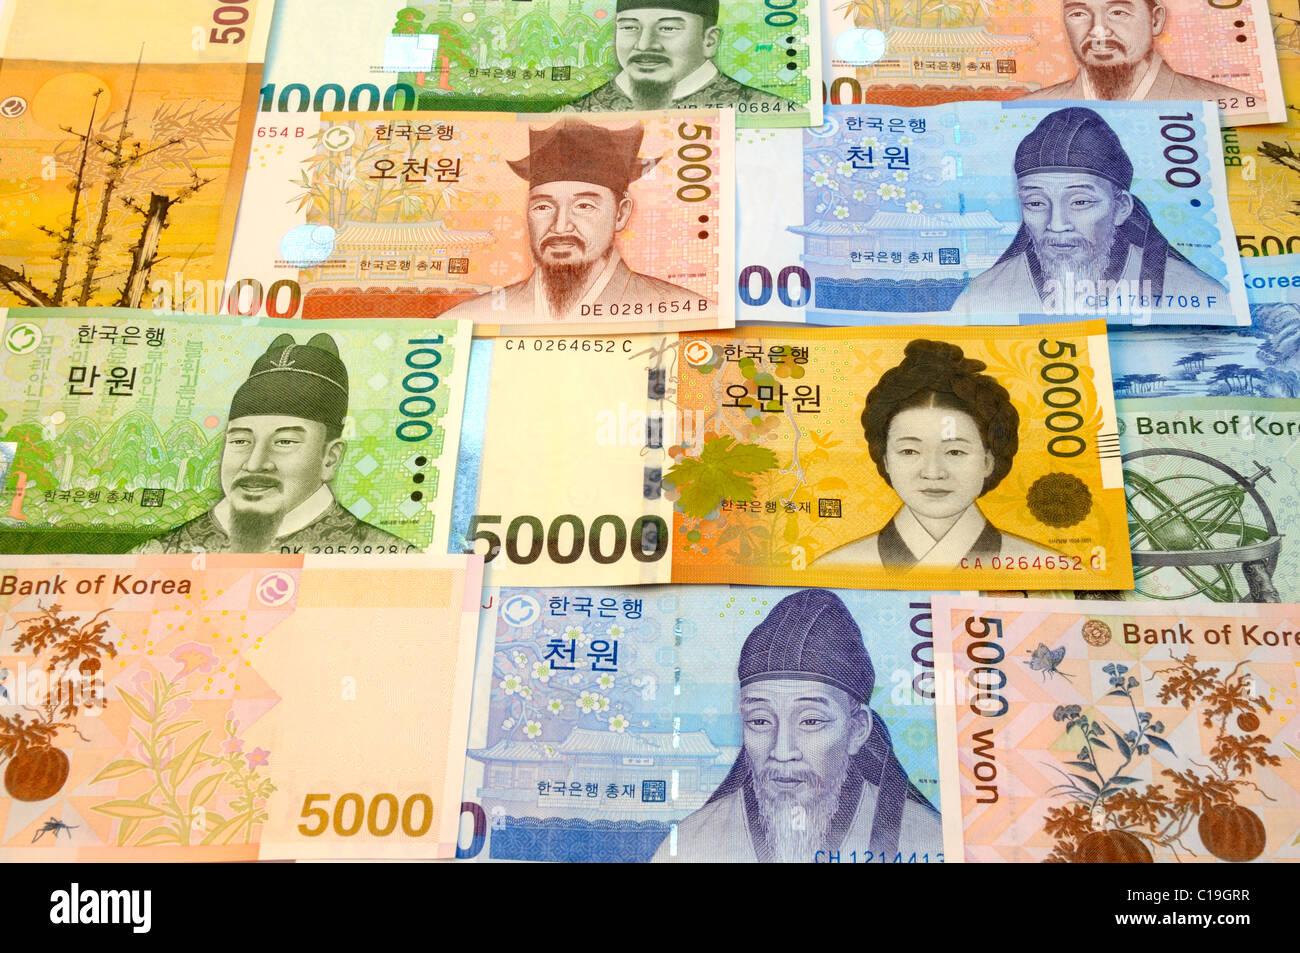 South Korea Won Bank Notes. - Stock Image